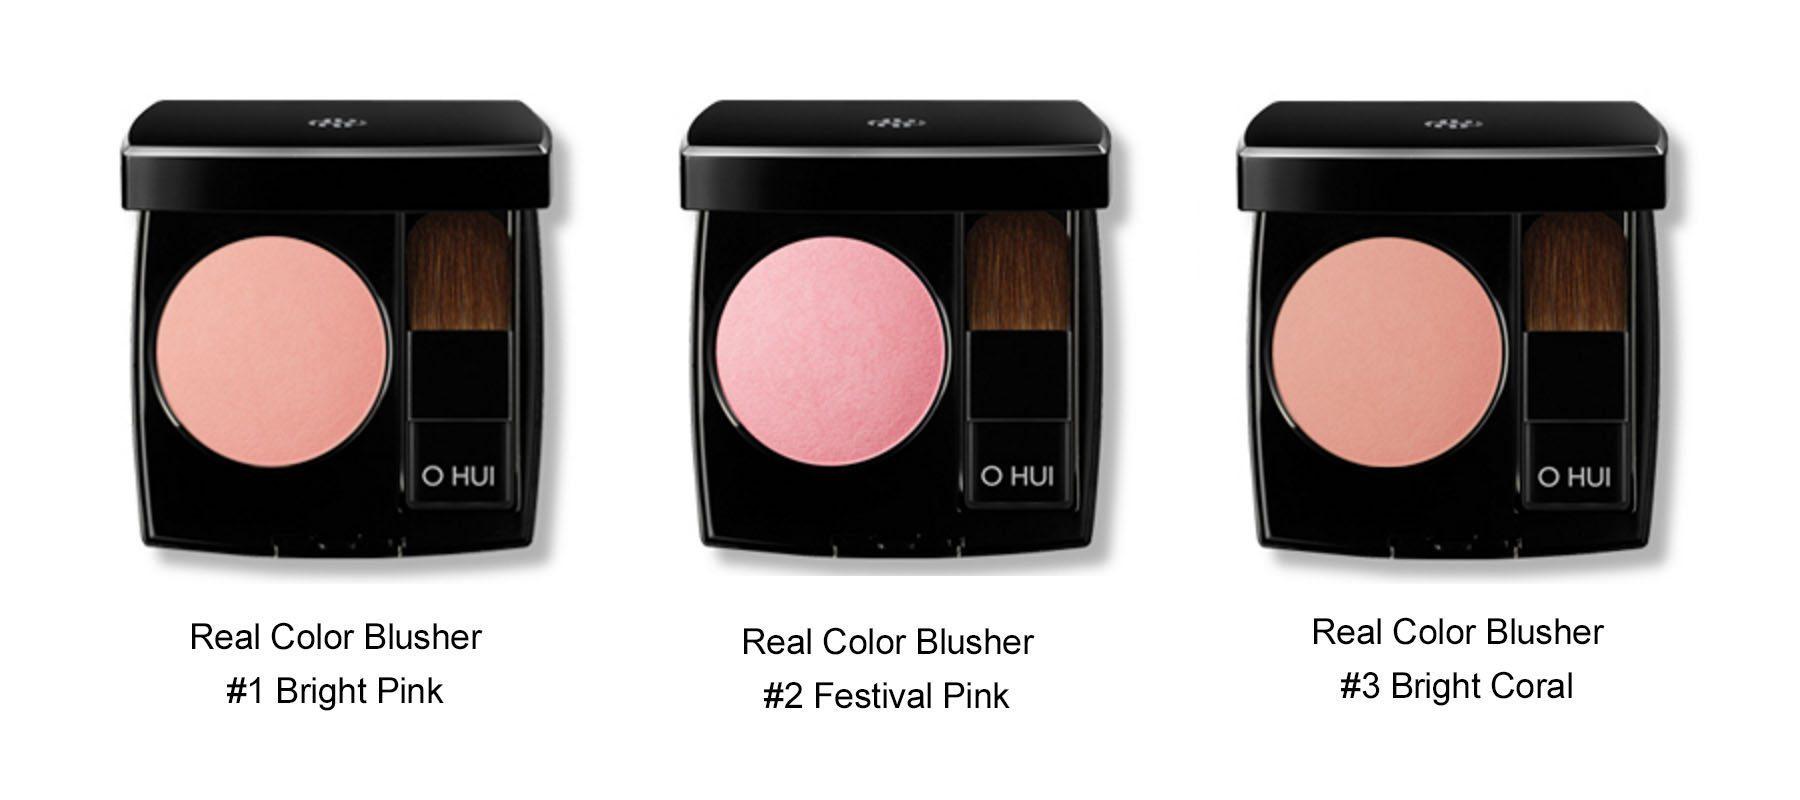 OHUI Real Color Blusher 17g malaysia singapore indonesia